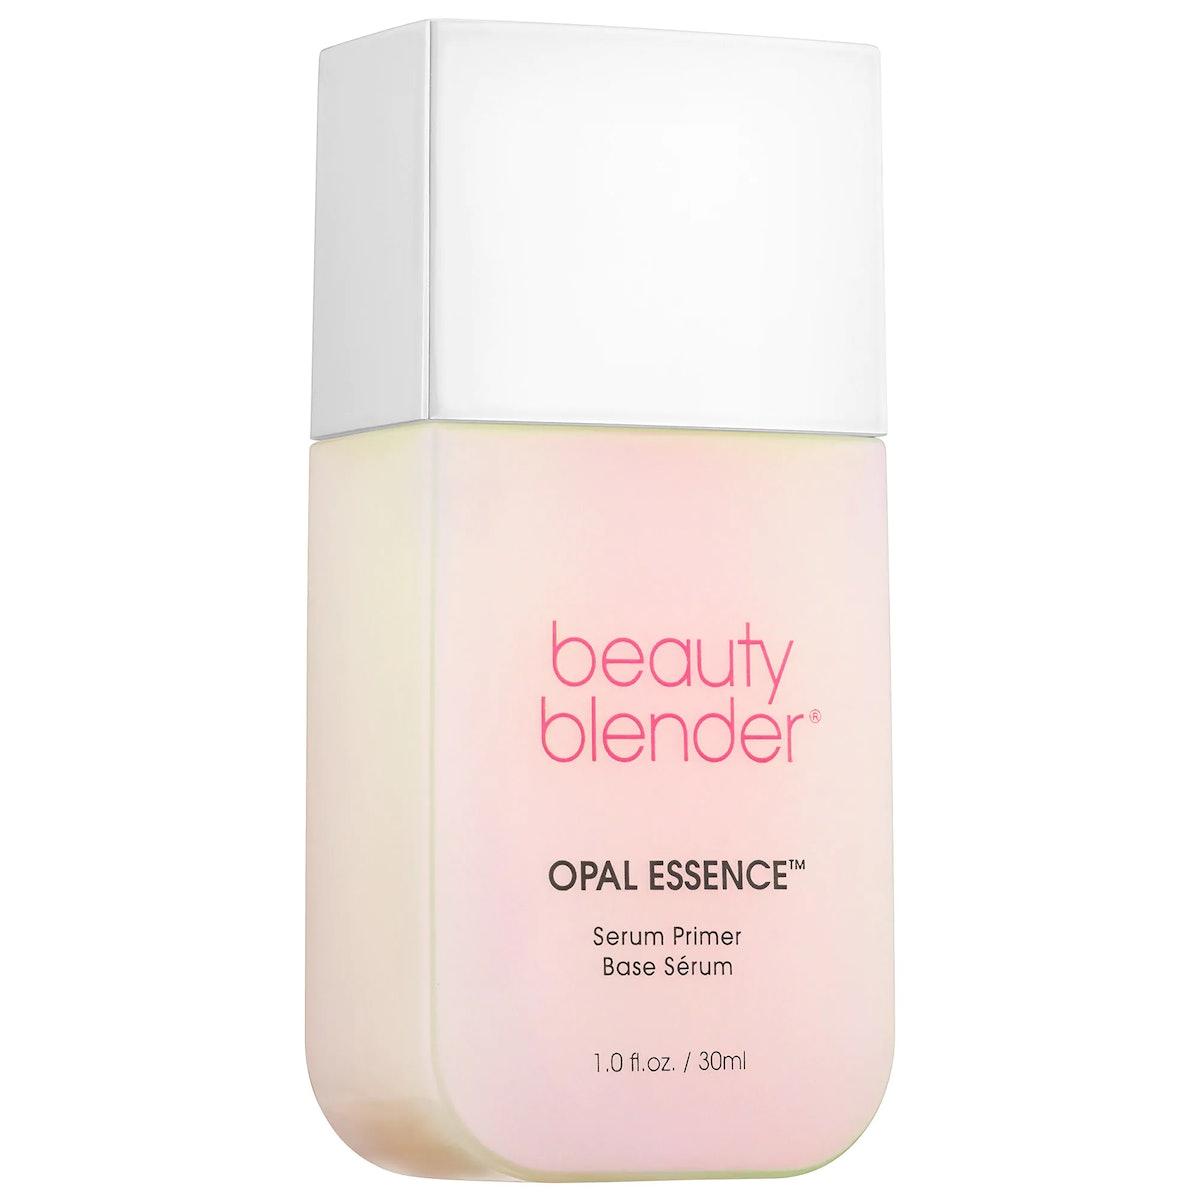 Beautyblender Opal Essence™ Serum Primer